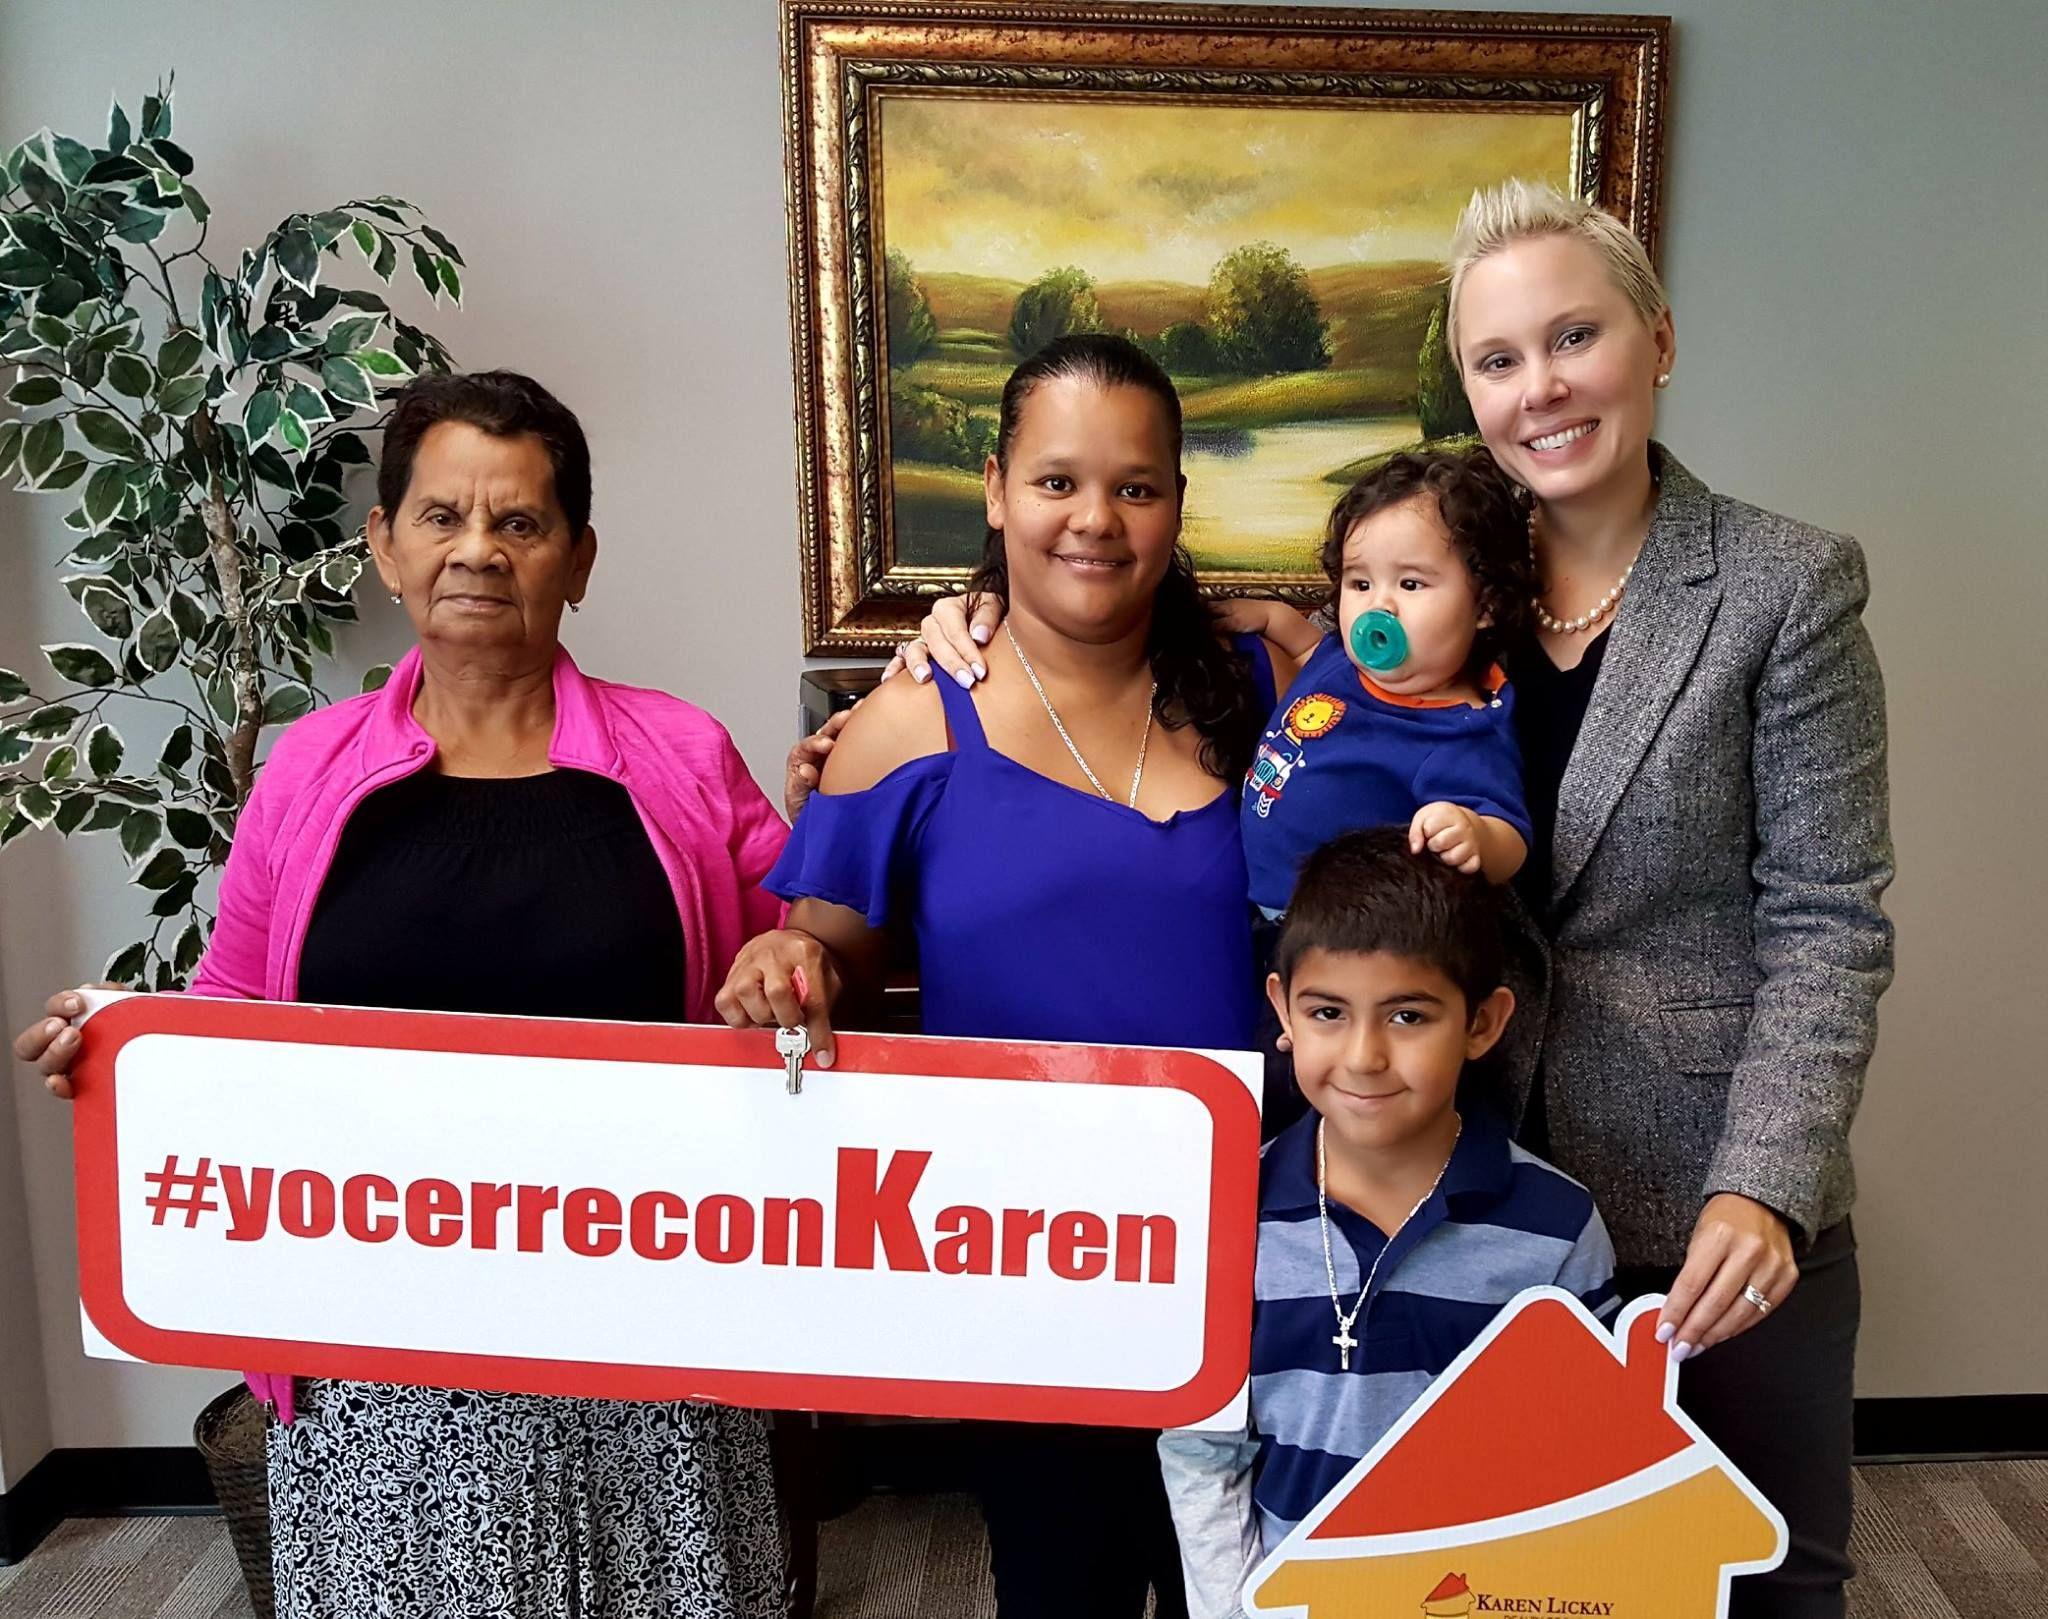 Karen lickay realty group thanks the ortiz family for